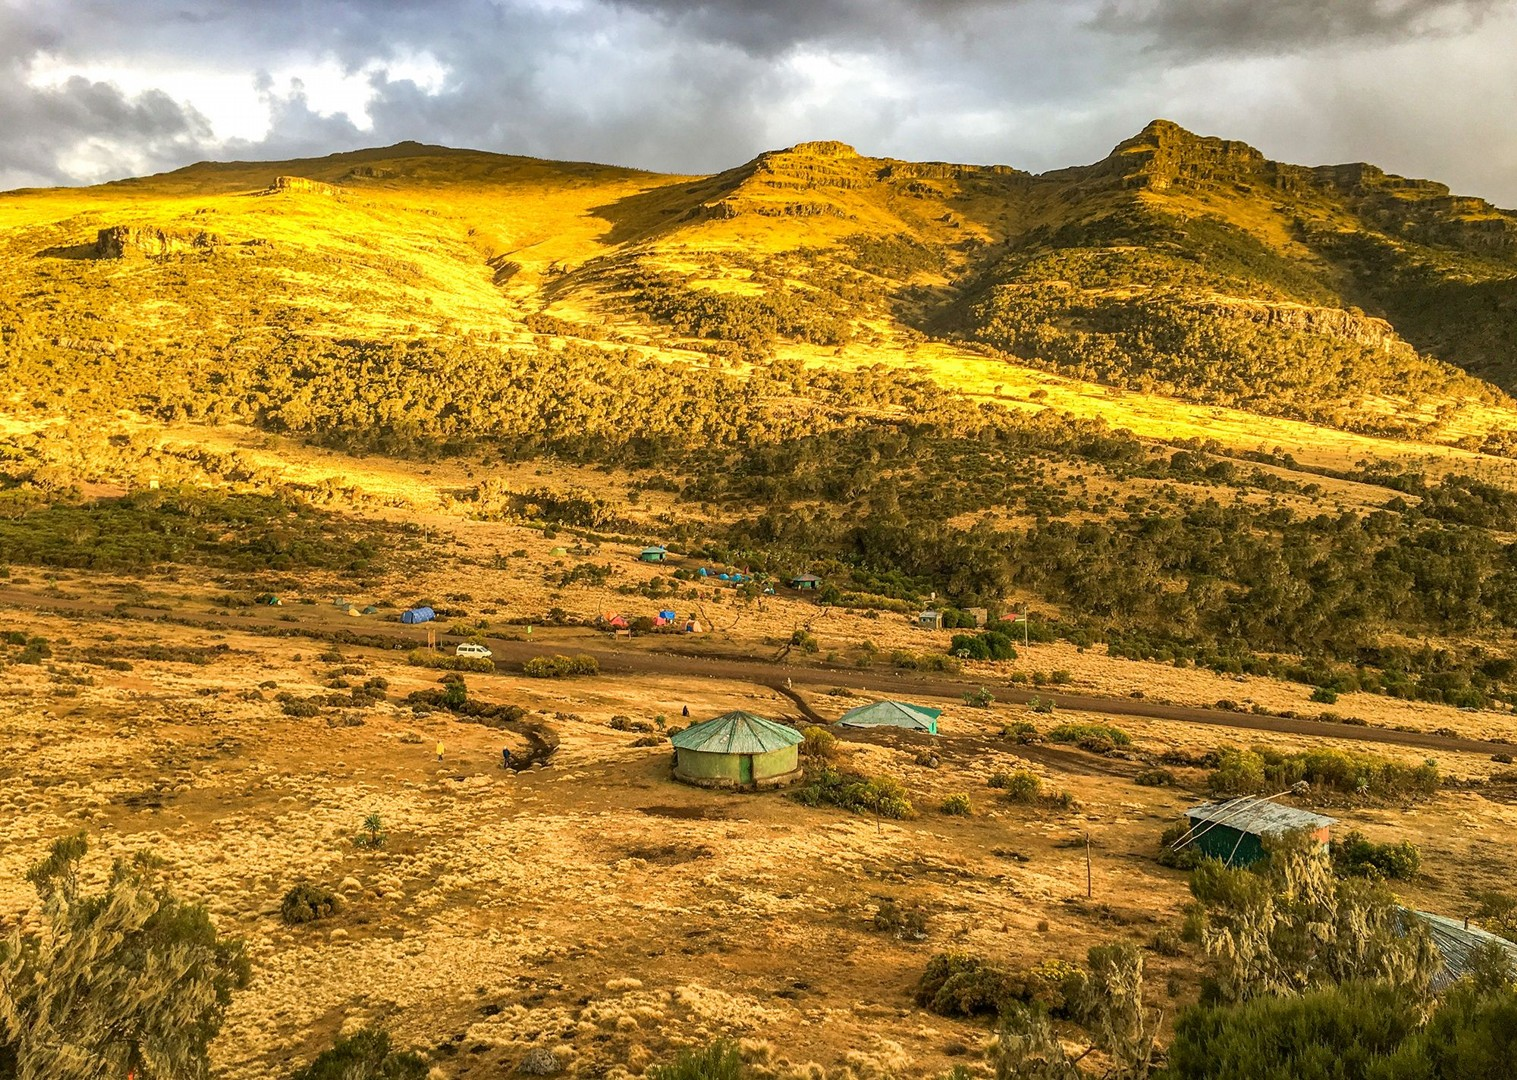 mountain-range-scenery-ethiopia-cycling-holiday.jpg - NEW! Ethiopia - Enchanting Ethiopia - Cycling Adventures